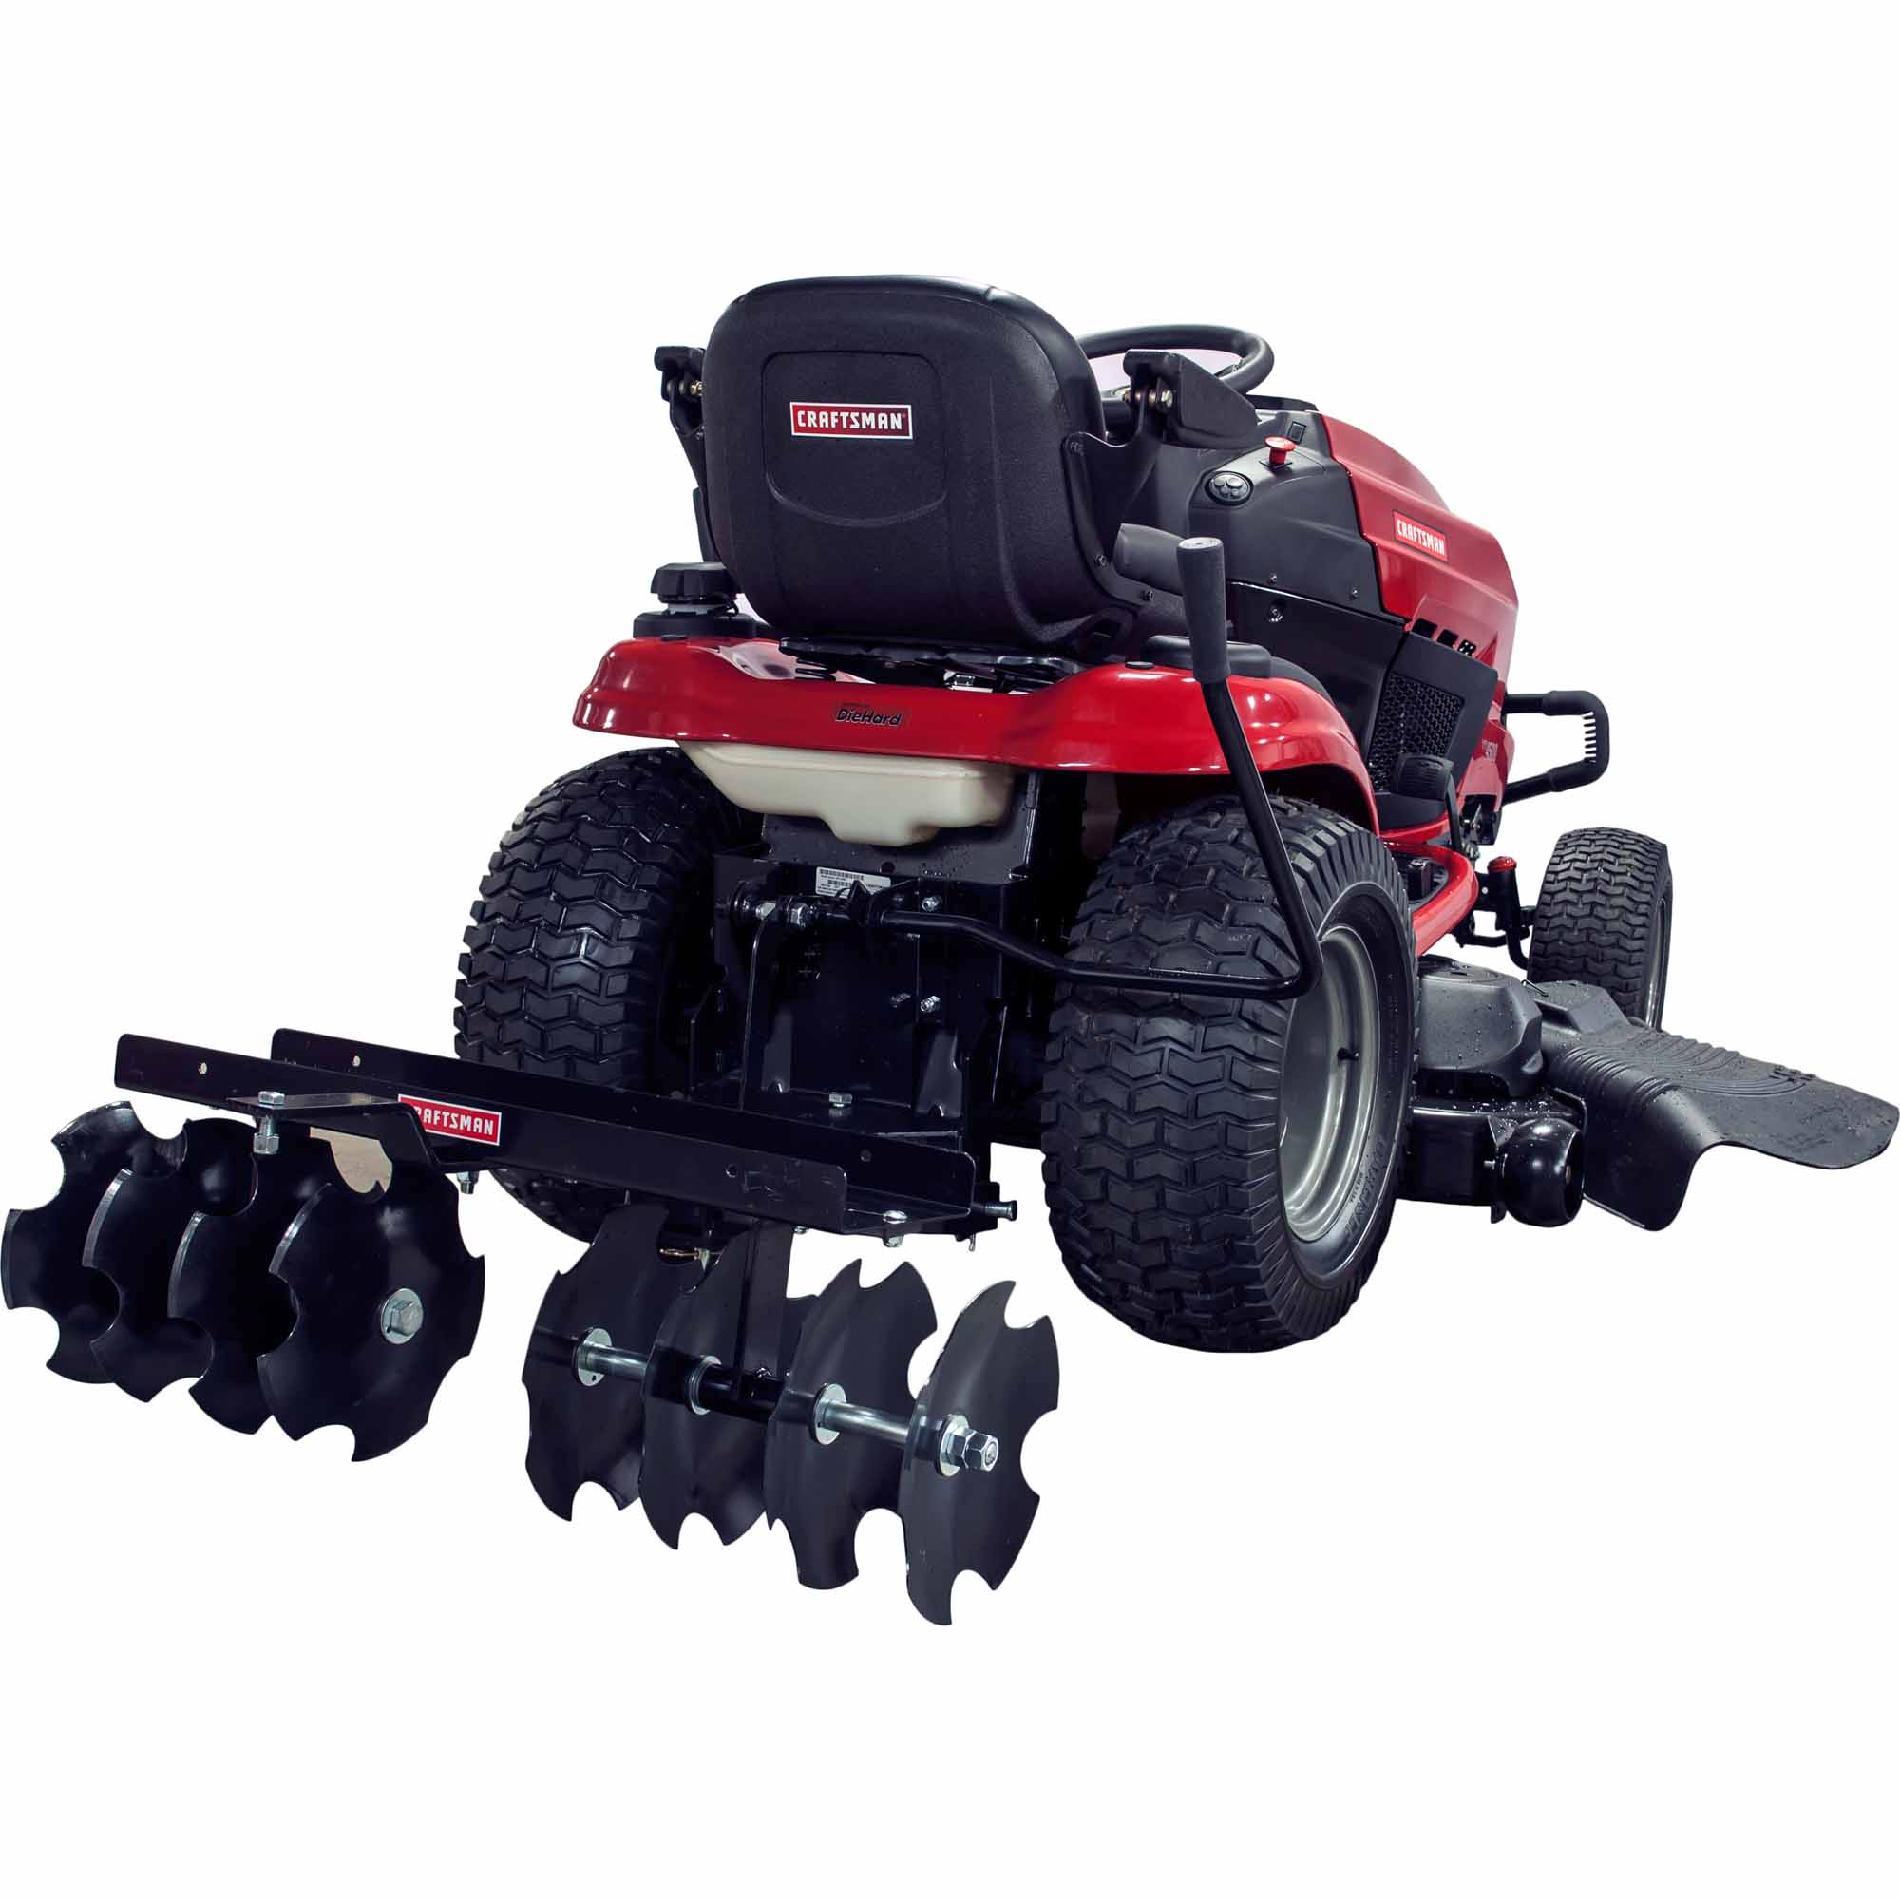 For Troy Bilt Garden Way Riding Mower Wiring Diagram Craftsman Garden Tractor Attachments Sears Com